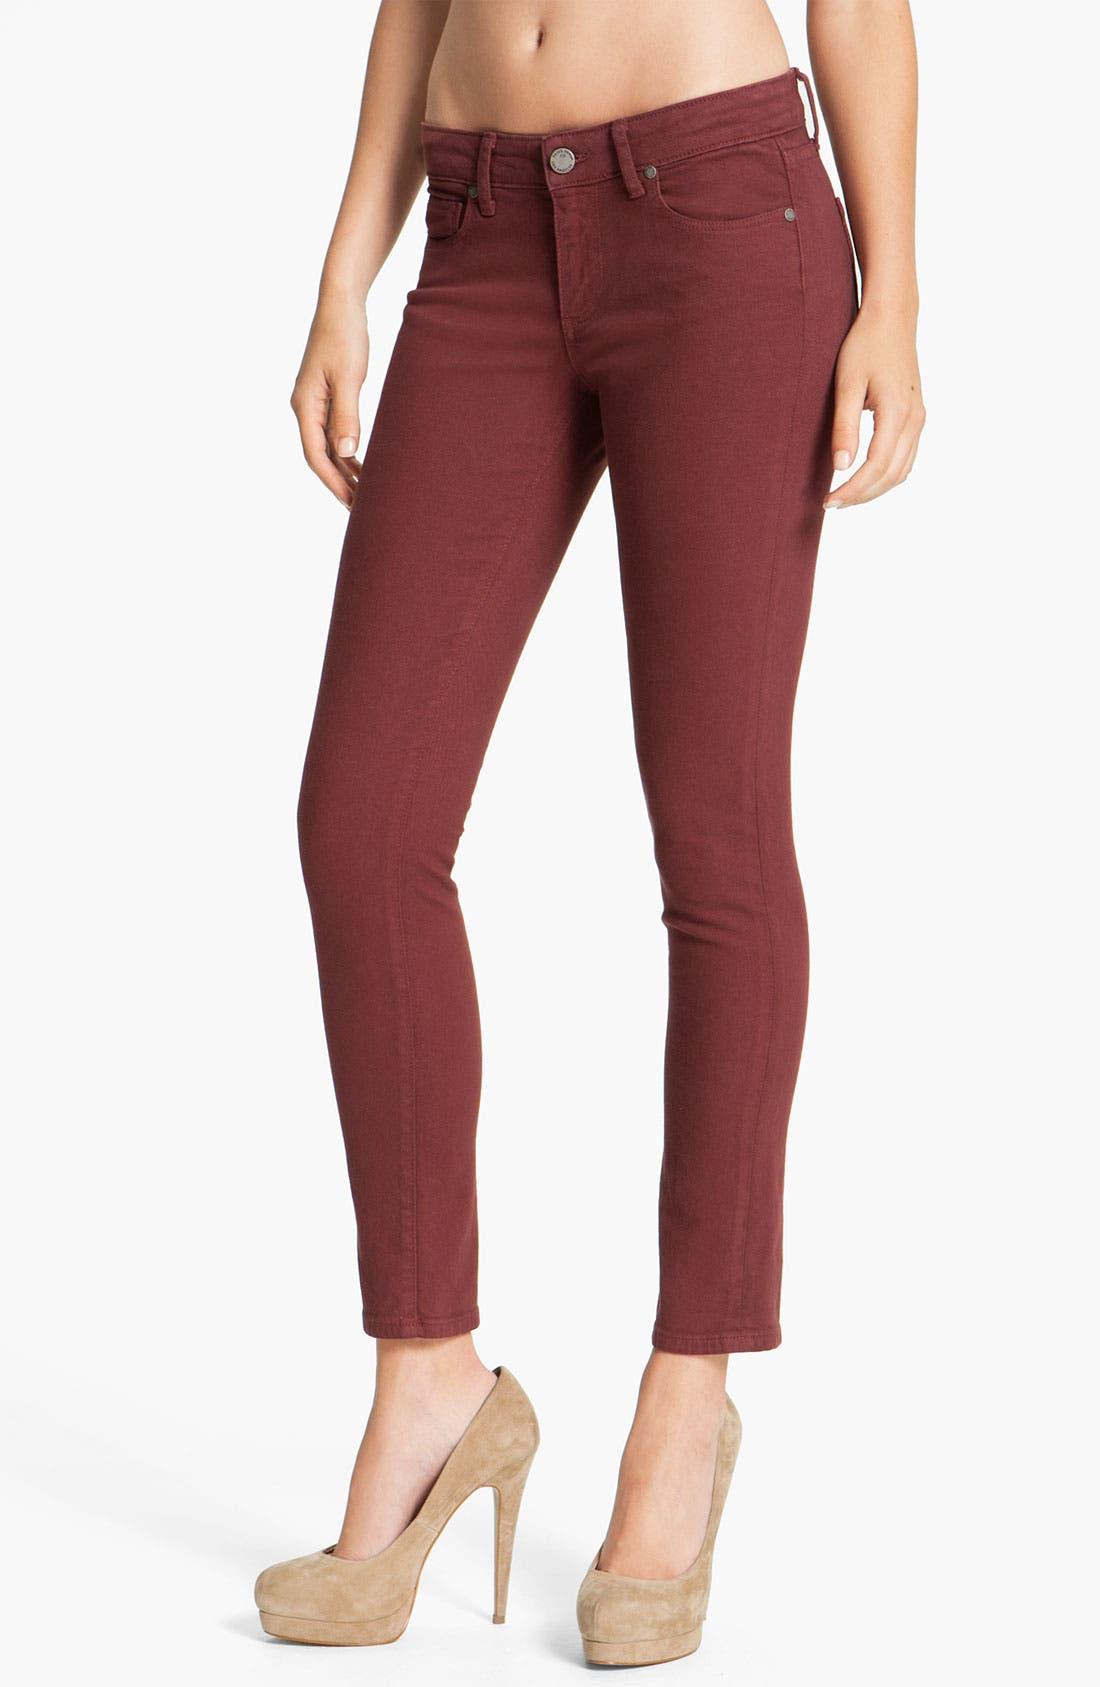 Alternate Image 1 Selected - Paige Denim 'Skyline' Skinny Jeans (Cheer)